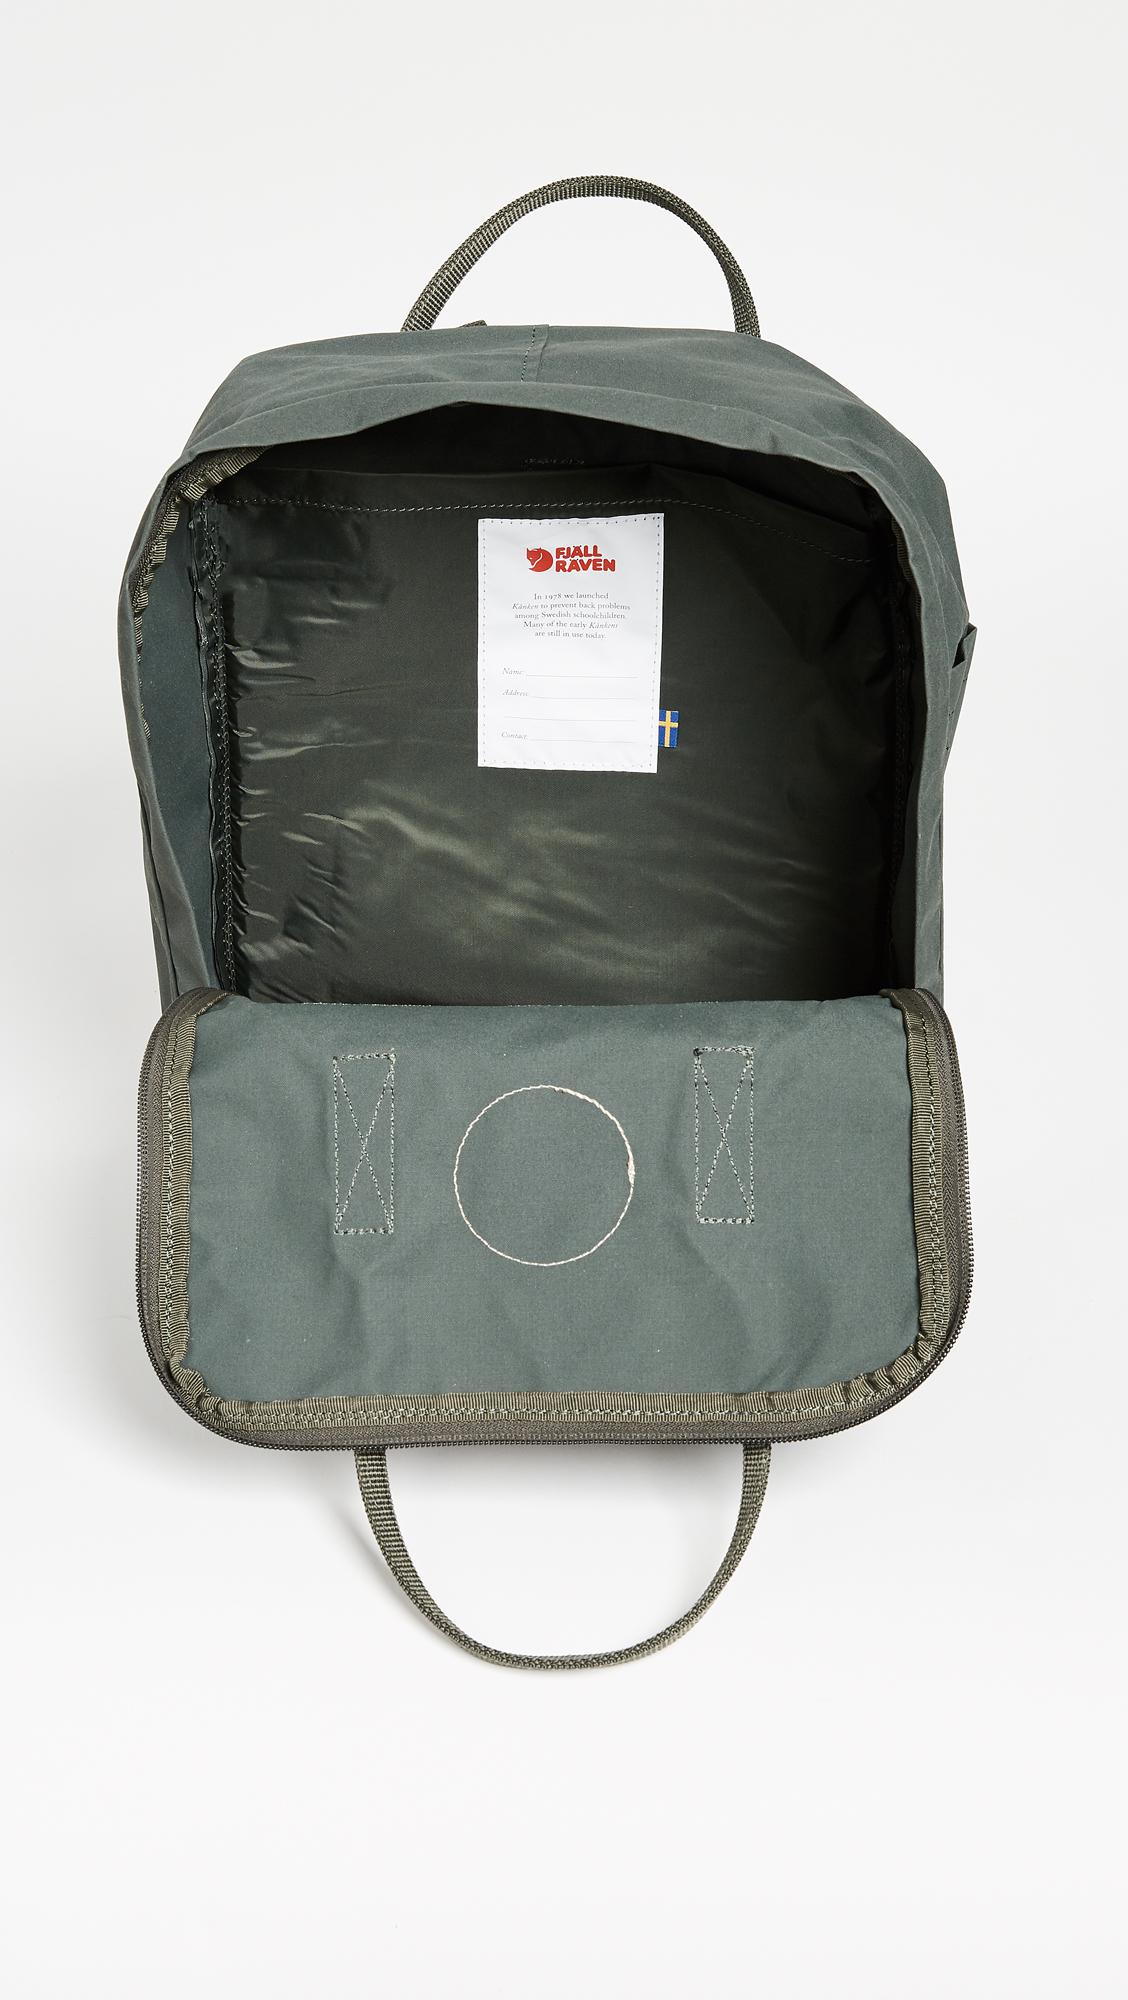 Fjallraven Kanken Backpack Shopbop Classic Birch Green